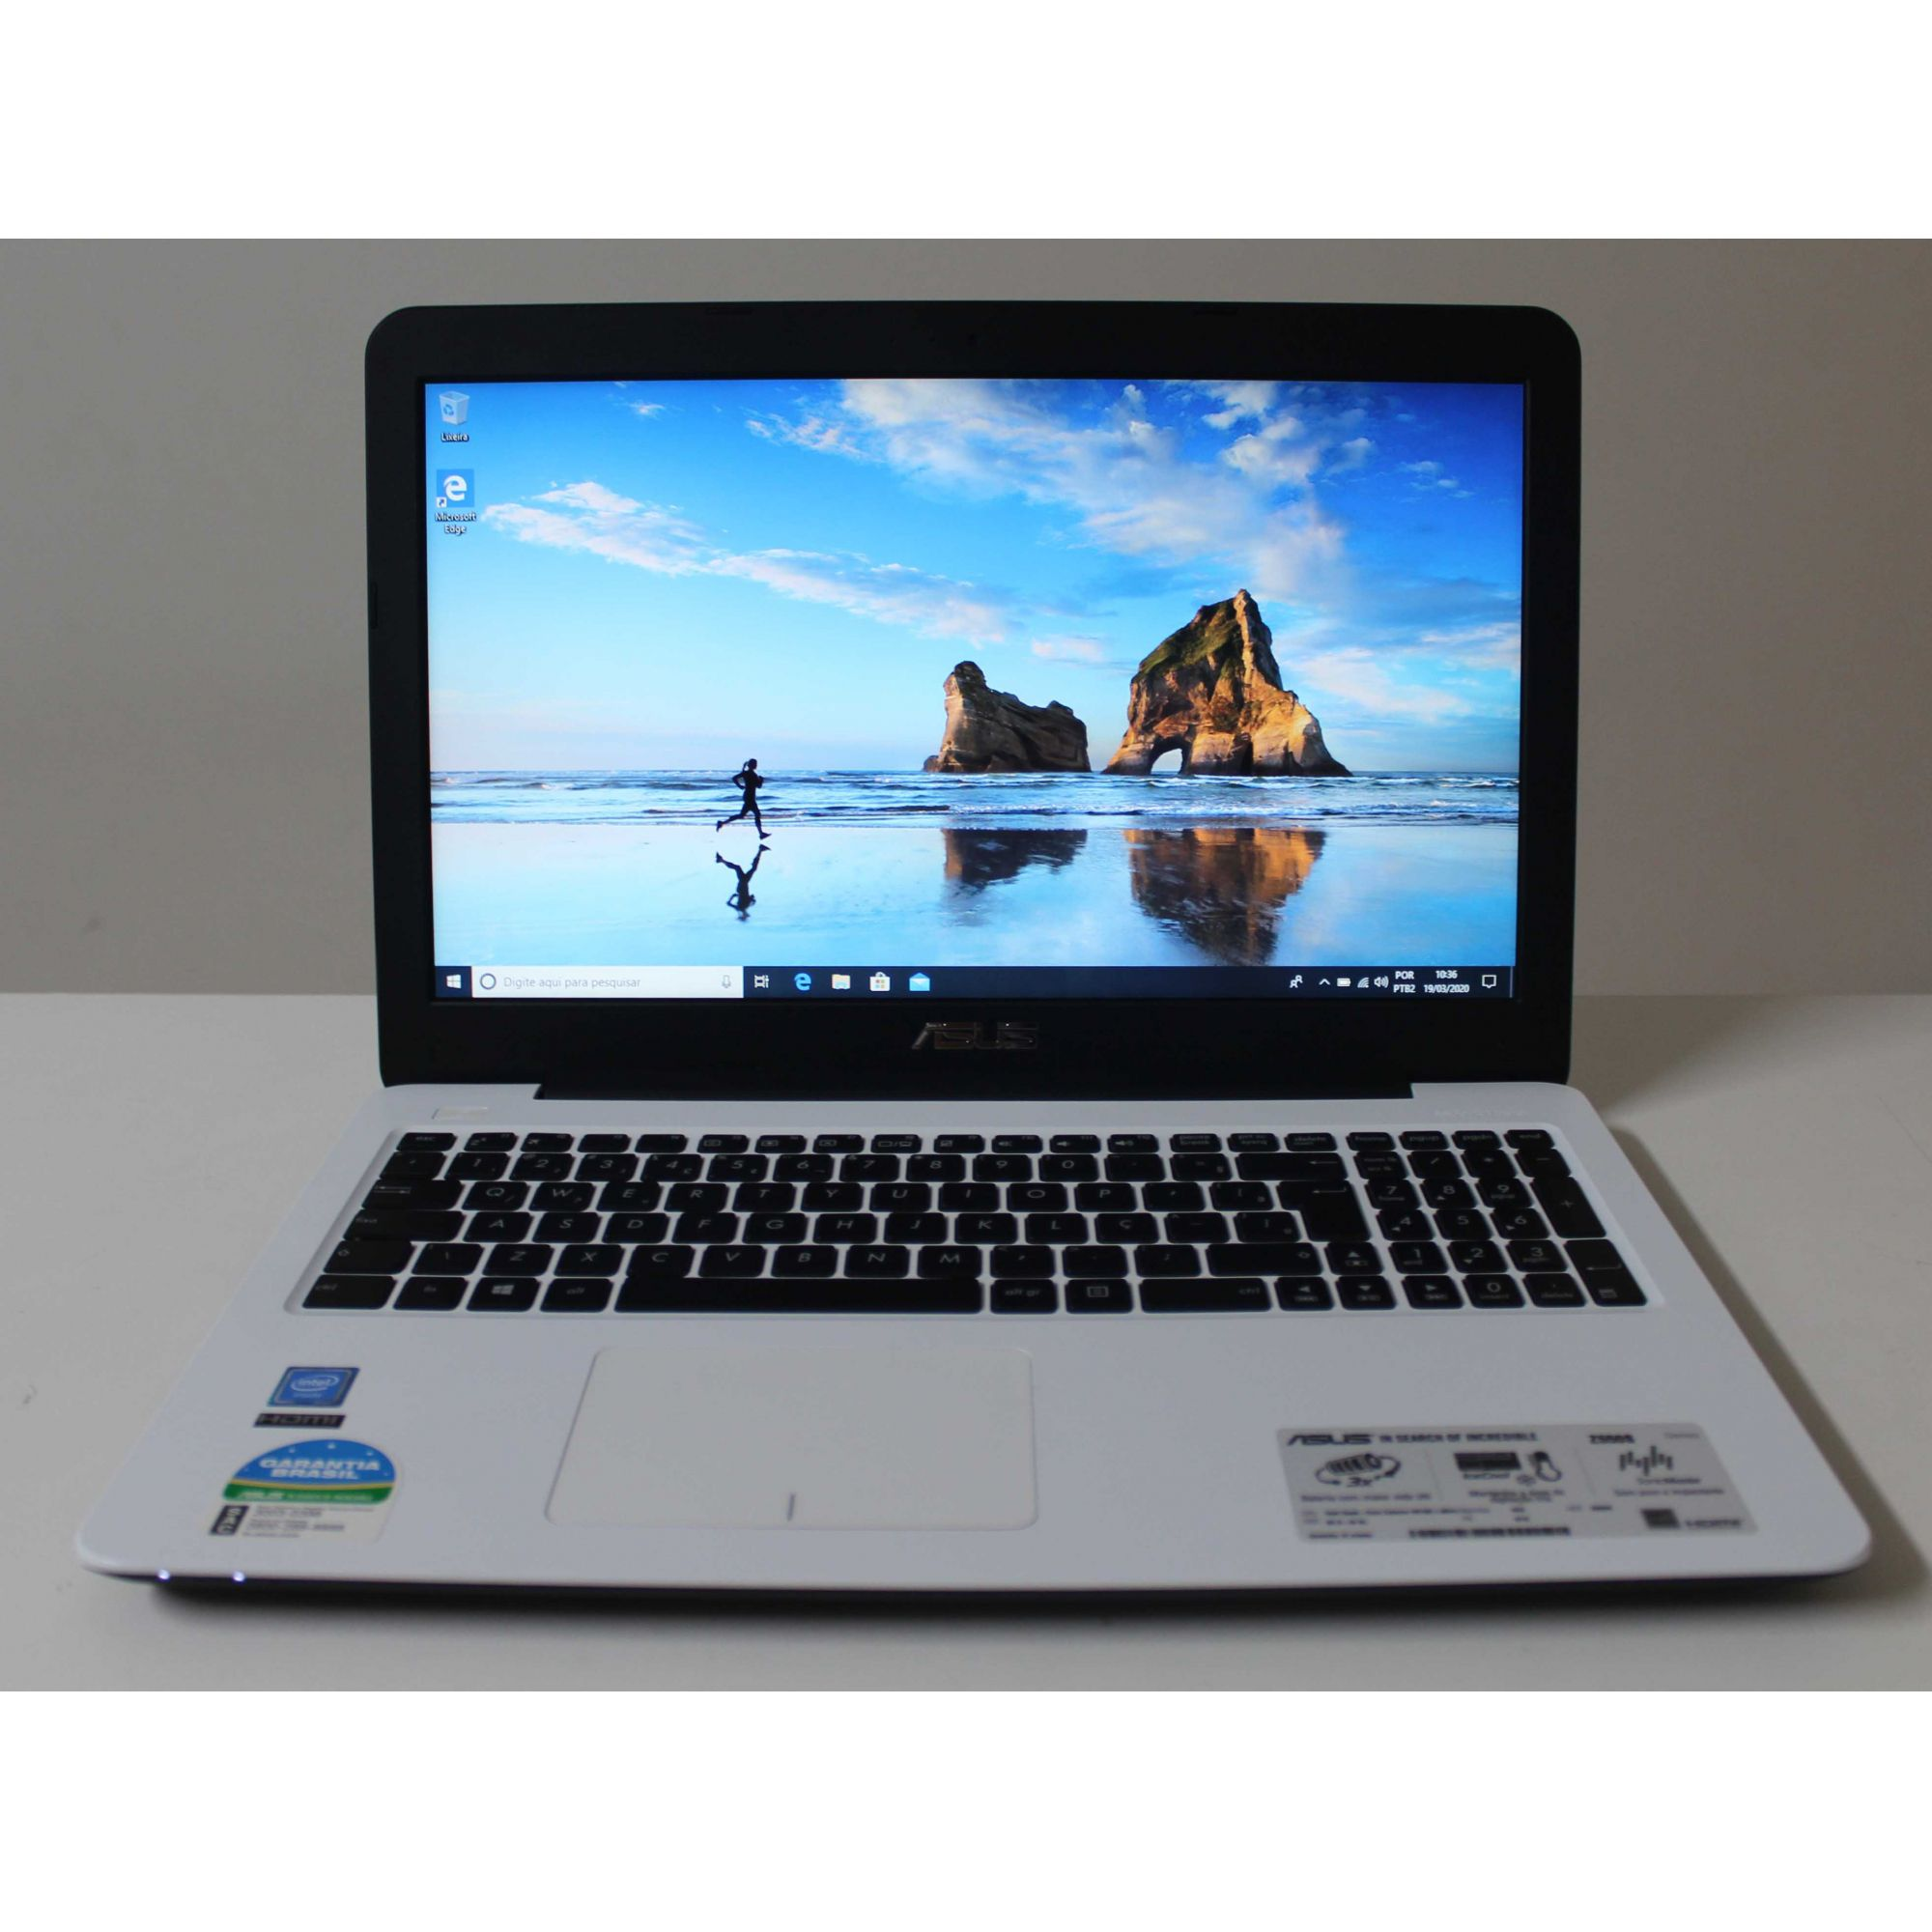 "Notebook Asus Z550SA 15.6"" Intel Celeron  1.60GHz 4GB HD-500GB + Alpha"